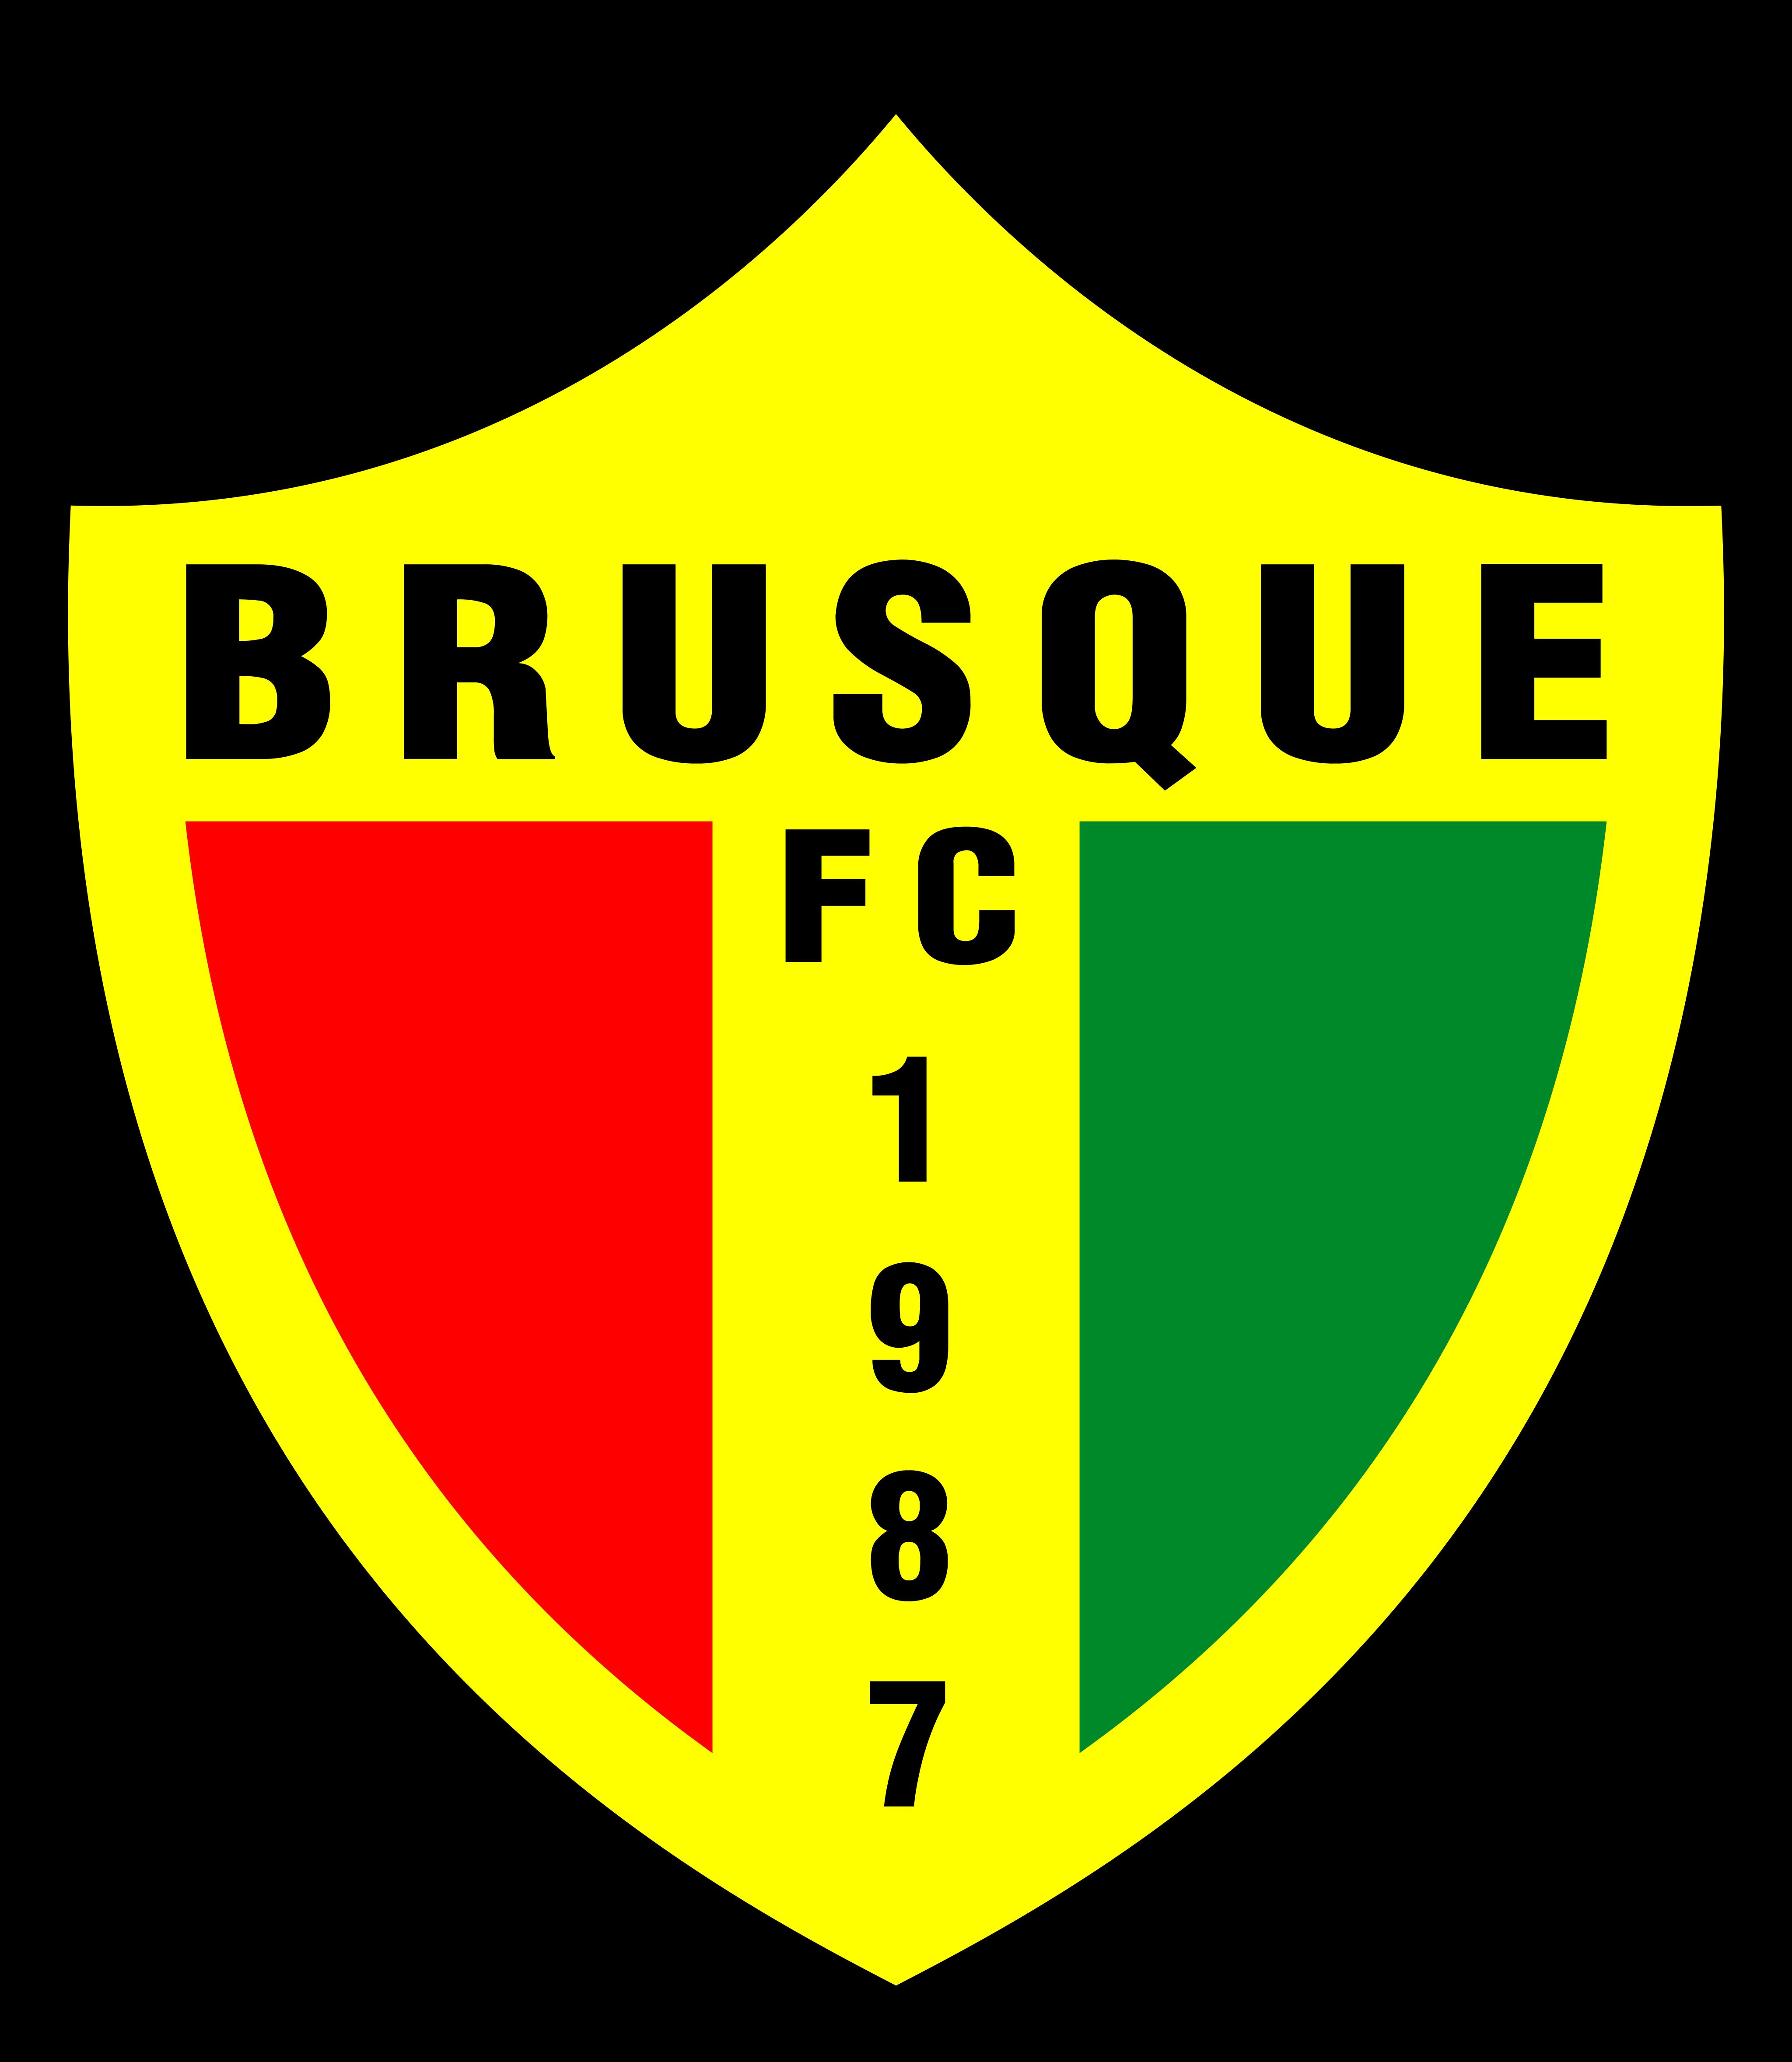 brusque fc logo 1 - Brusque FC Logo (Brazil)